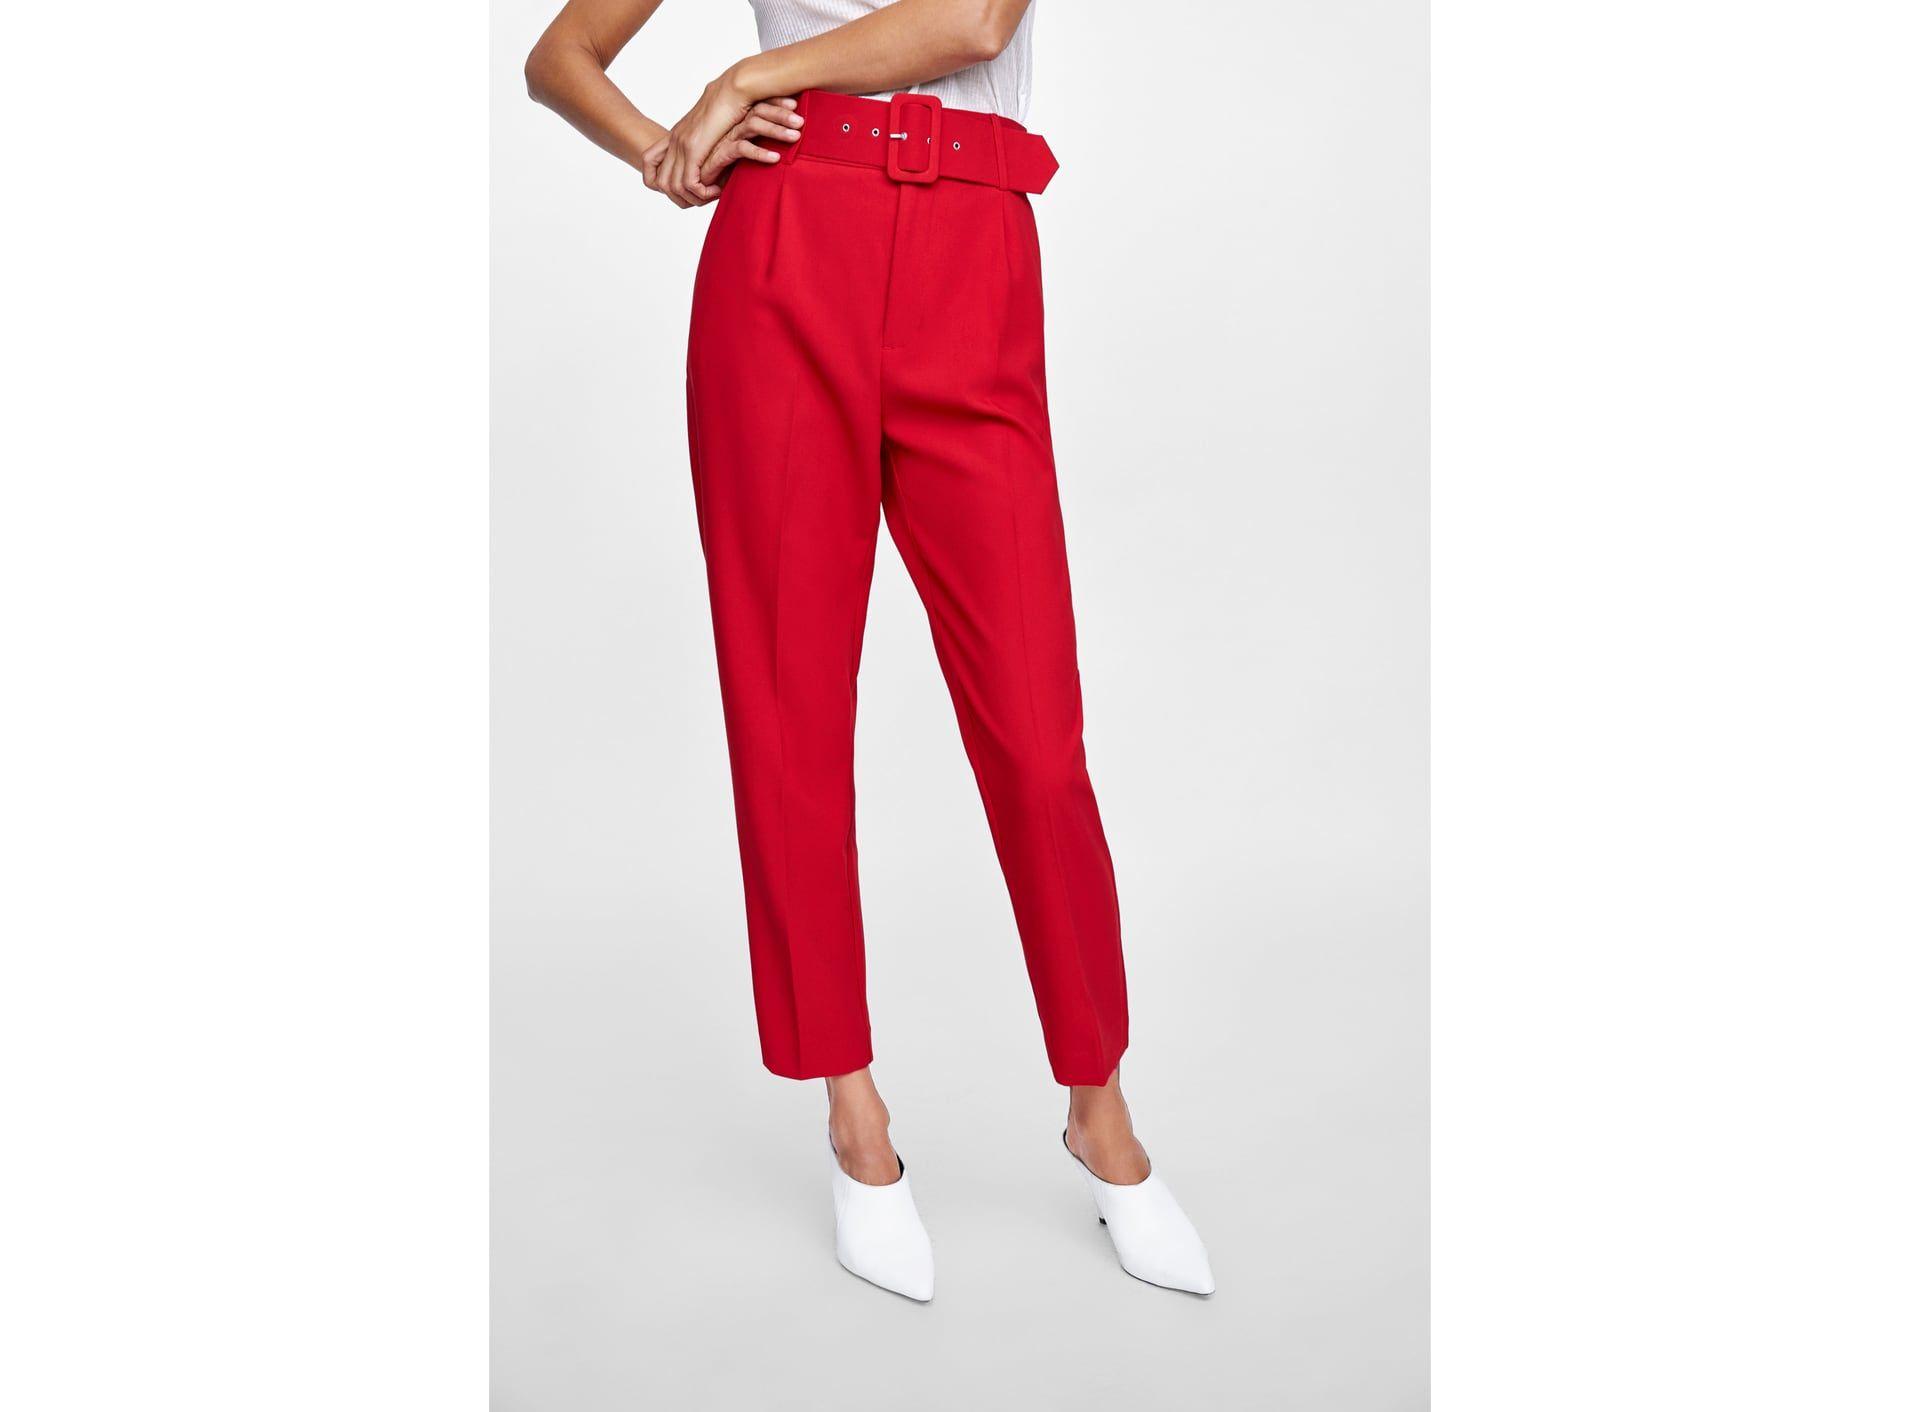 Mikrofon Fuggoleges Titok Pantalon Tiro Alto Cinturon Zara Quicknderby Com